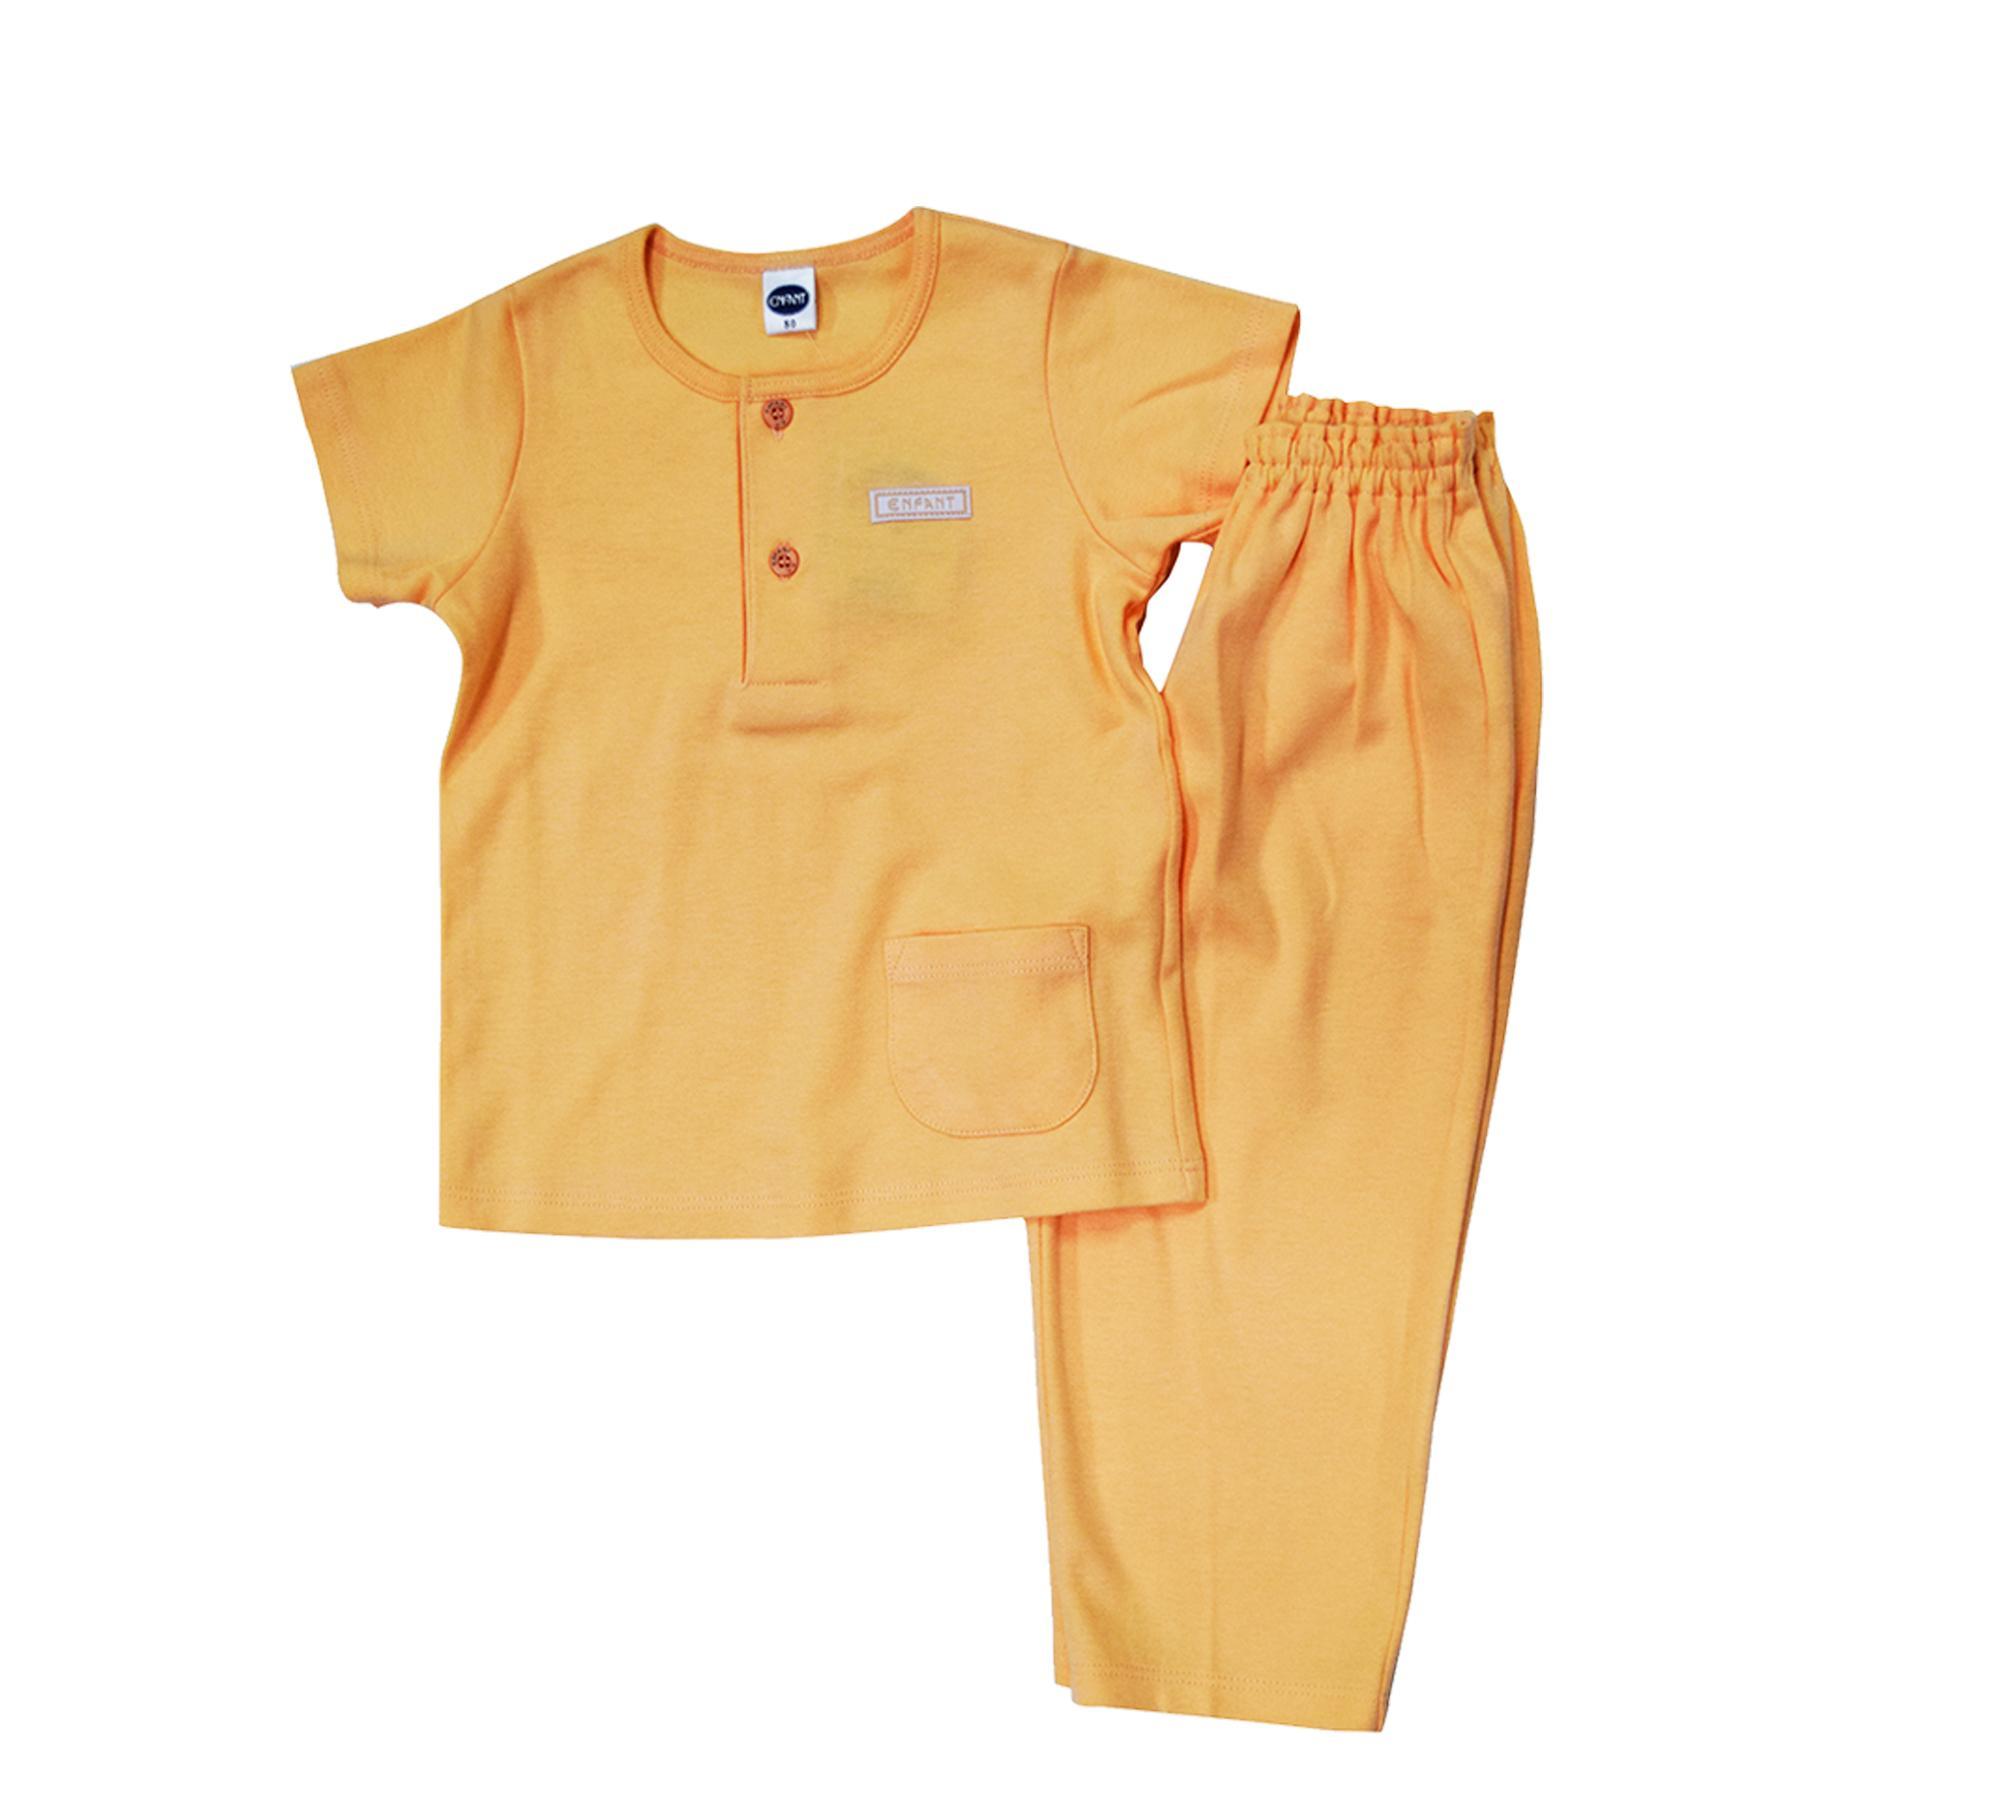 Enfant Baby Boy Pajama Set Short Sleeves 18-24 Months By Enfant Specialty Shop.